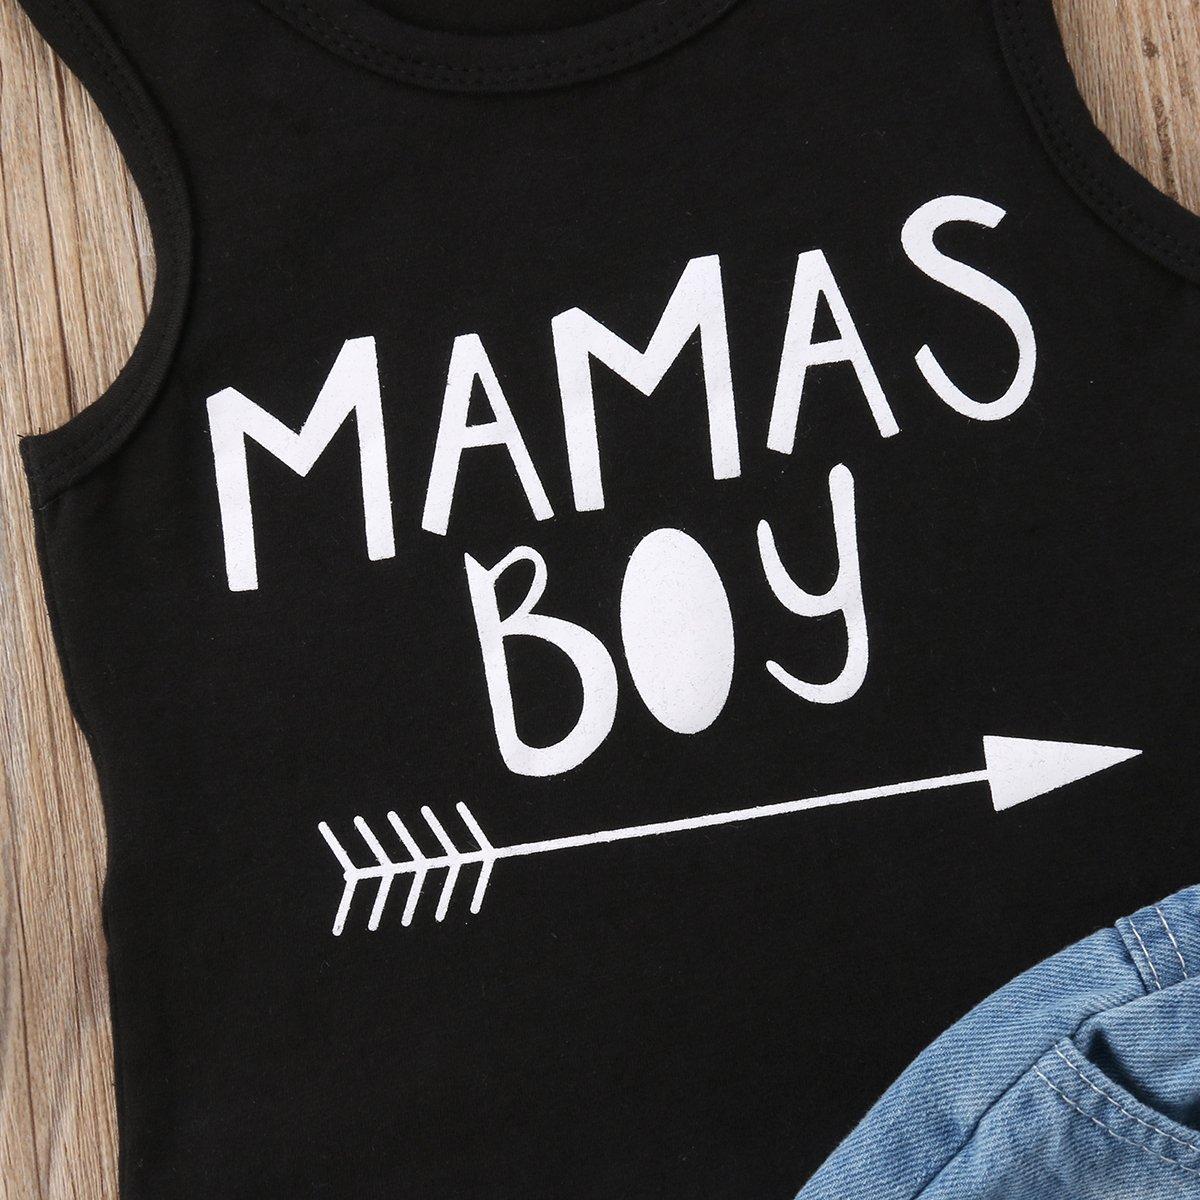 Cute Toddler Outfit Baby Boys Clothing Mamas Boys Arrow Print Vest Top Holes Denim Shorts Set